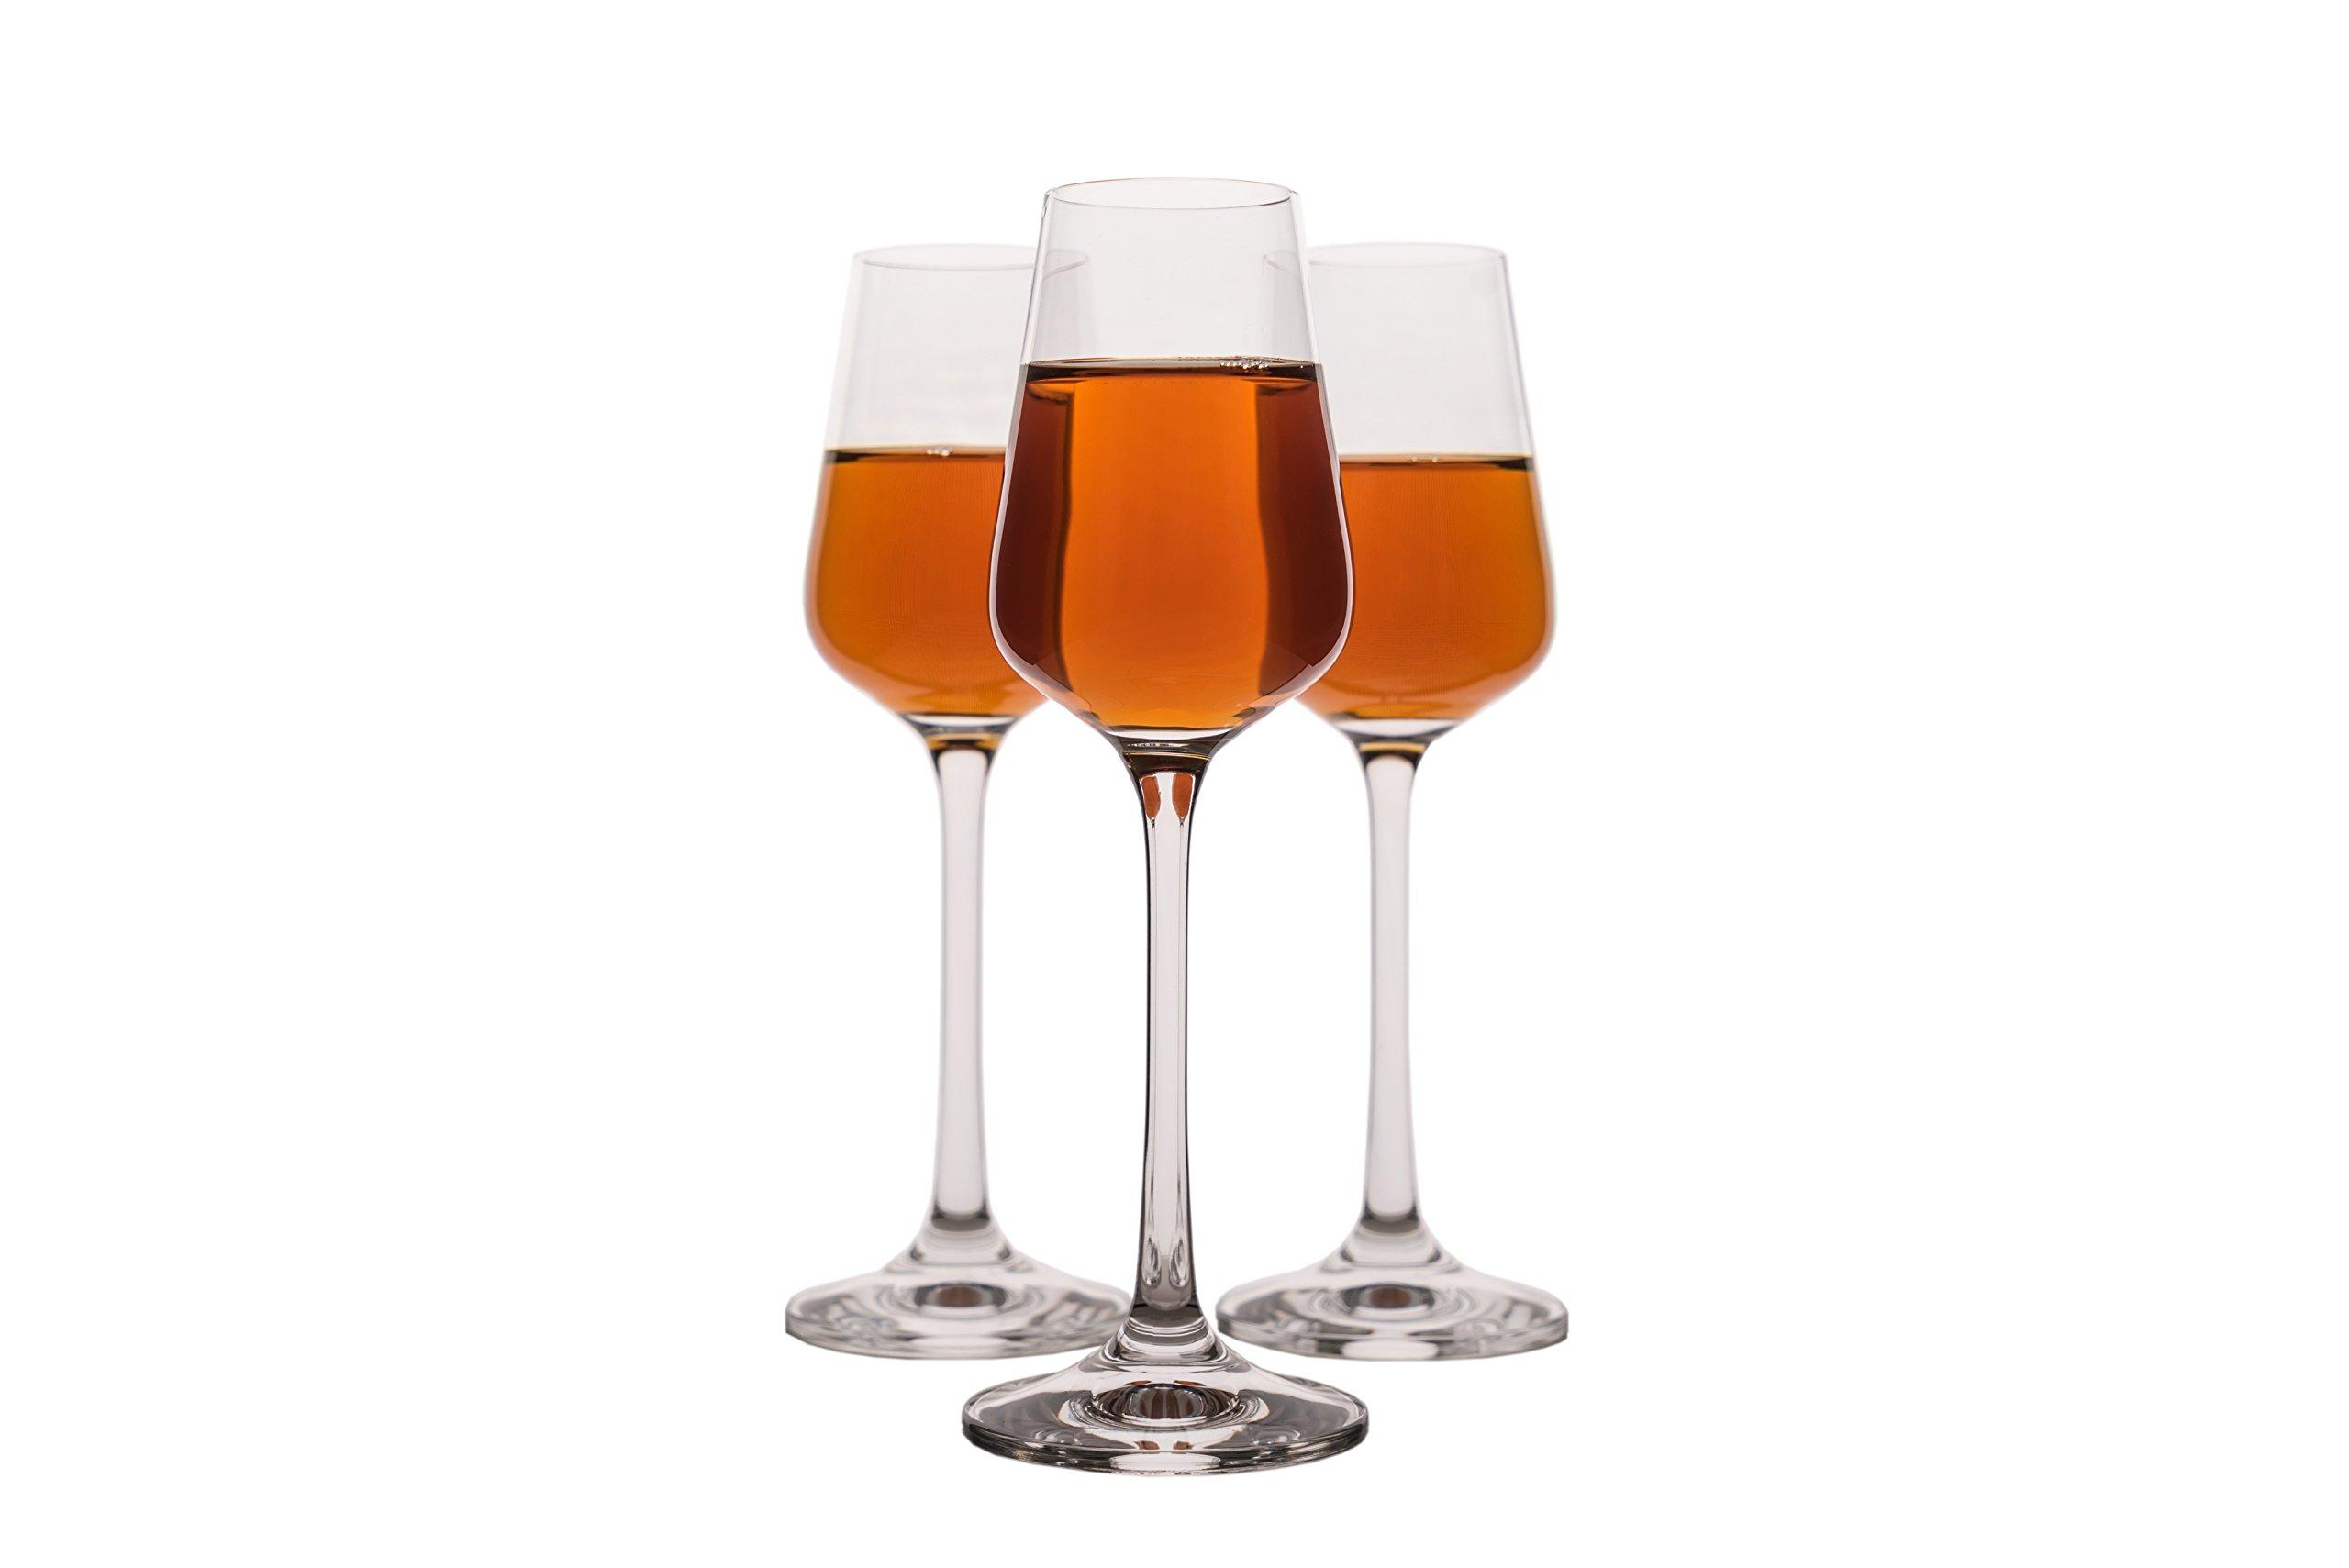 Small Liquor Glasses Set (6 pack), Hard & Durable Crystal Clear Stemware - 2.1 Oz/65ml